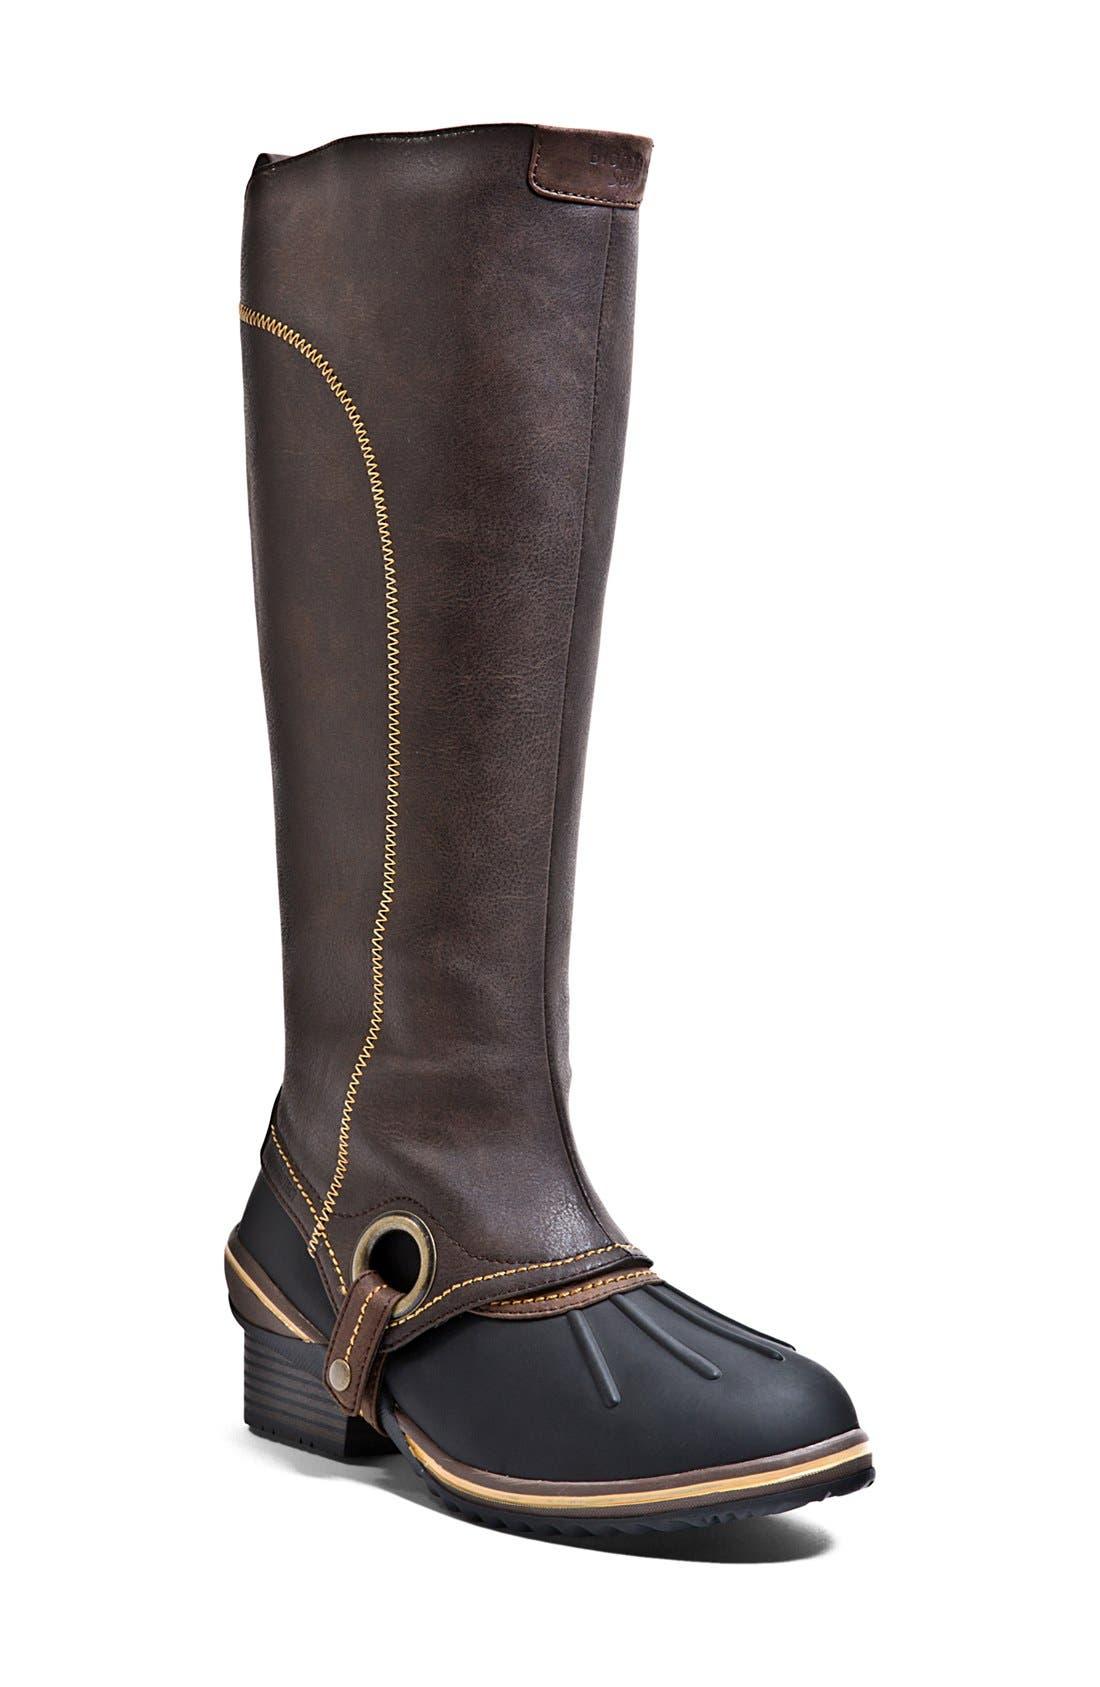 Main Image - Blondo 'Milady' Waterproof Boot (Women)